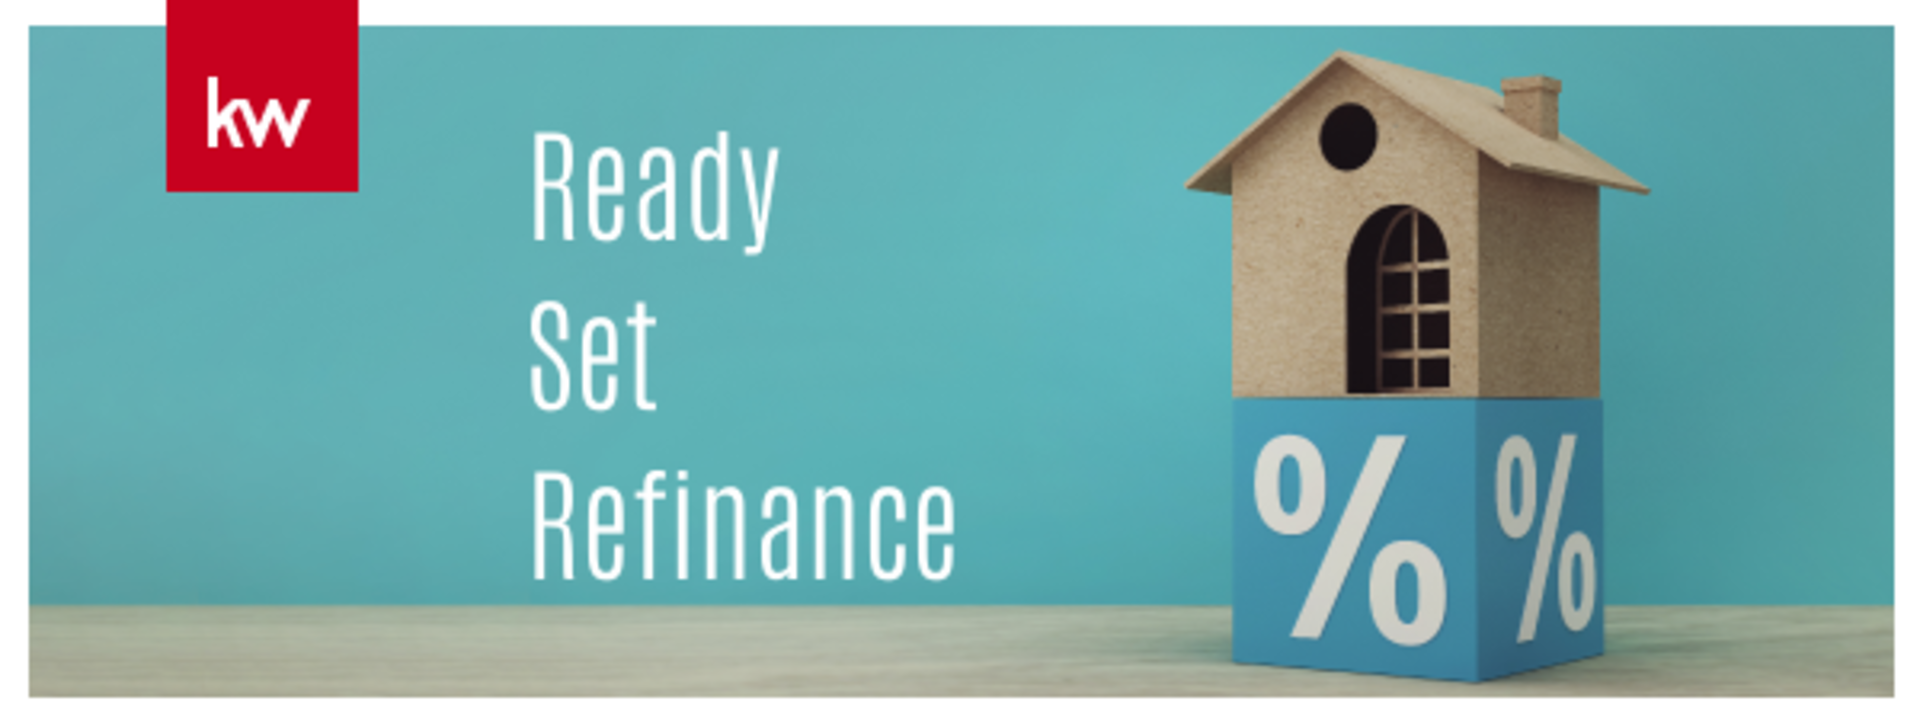 Ready Set Refinance